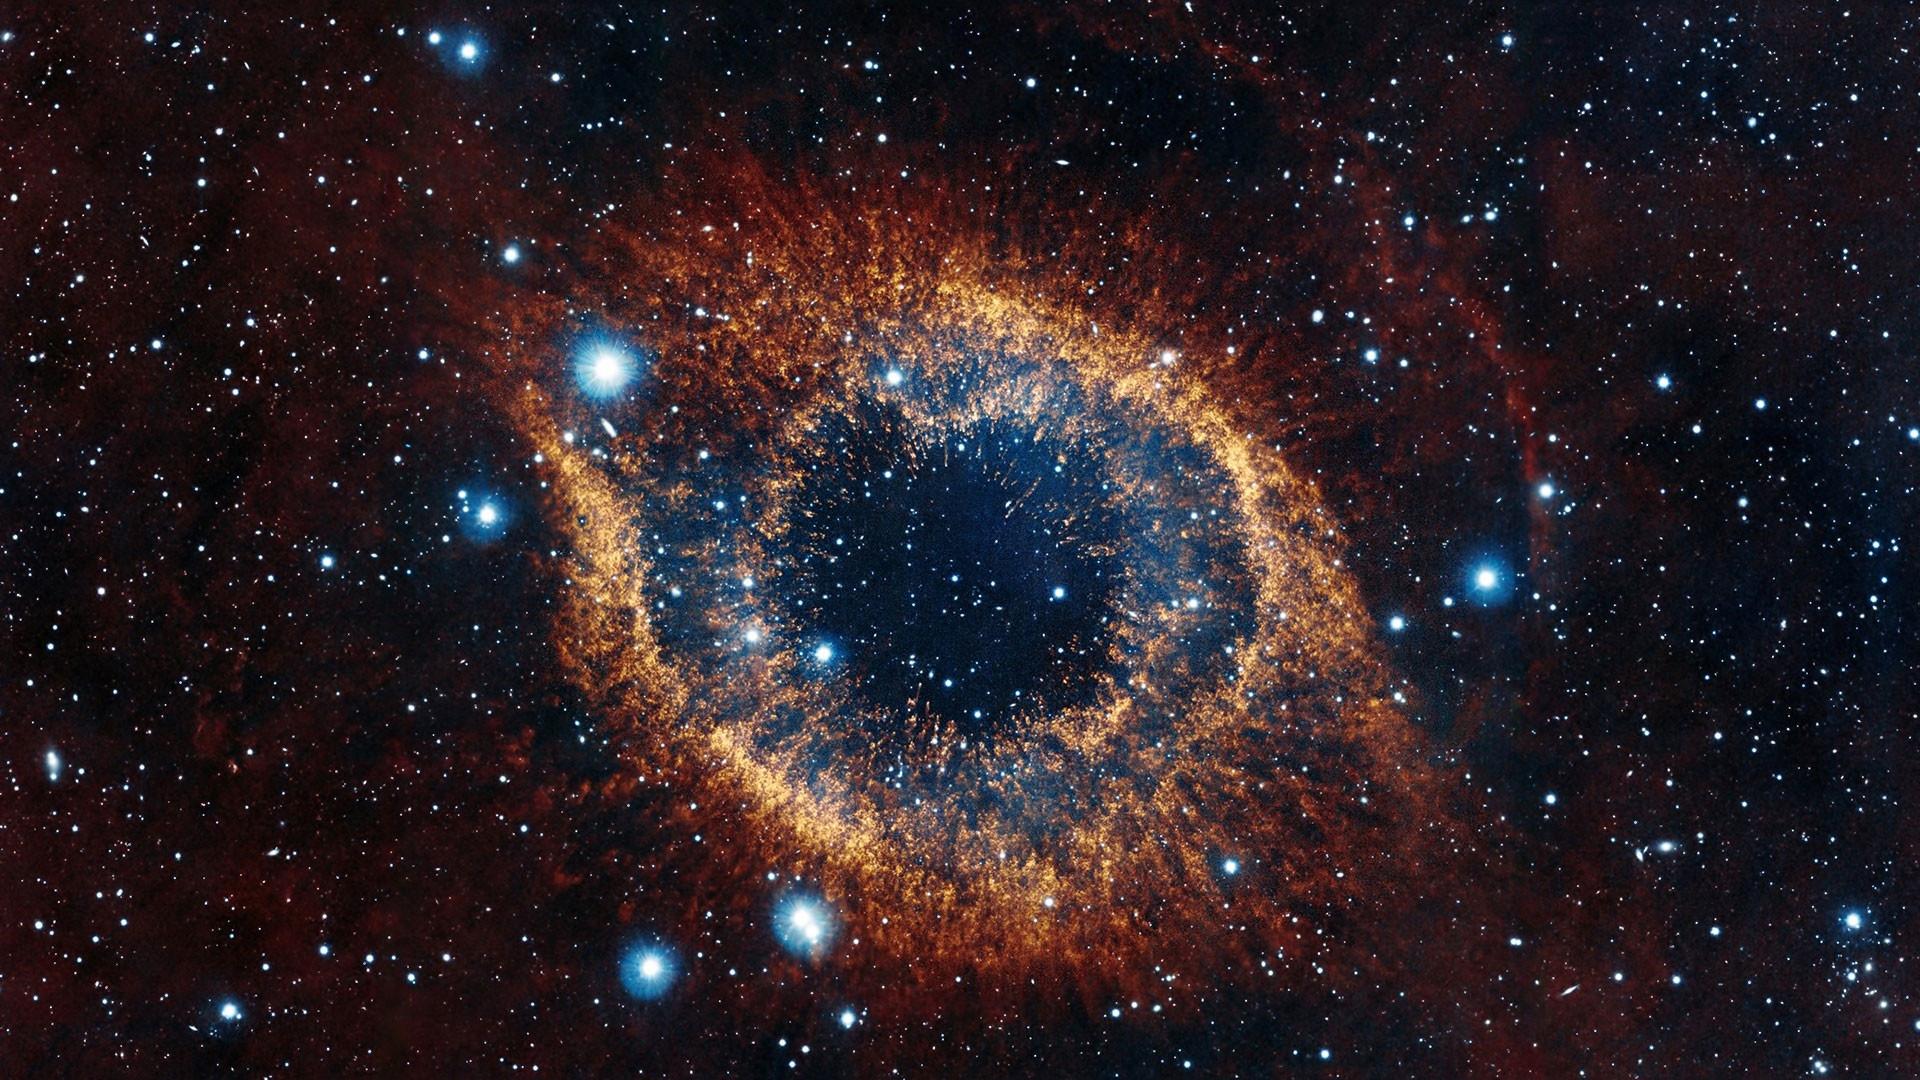 hd pics photos space nebula stars night 7 desktop background wallpaper